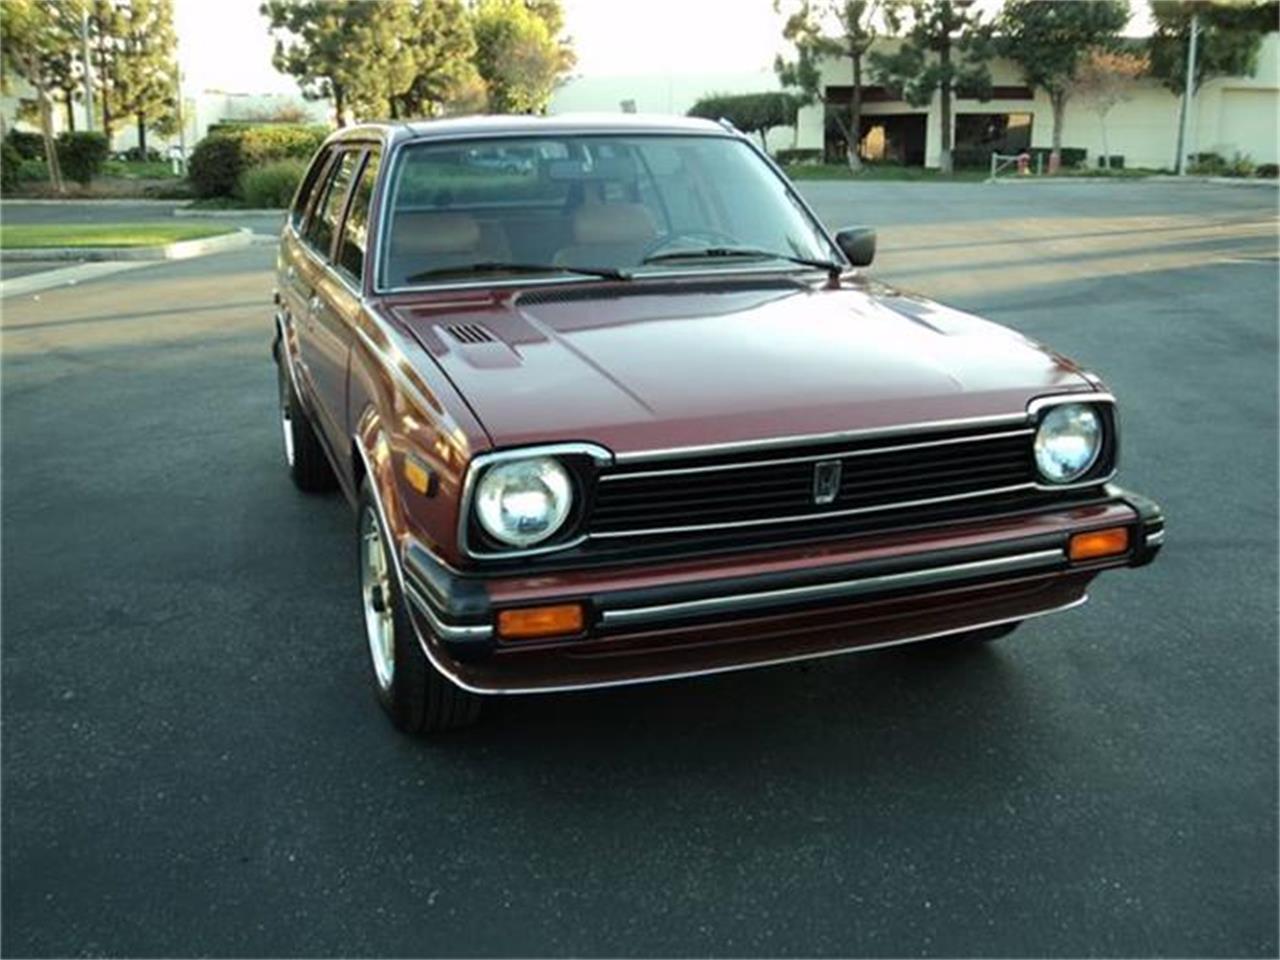 1980 Honda Civic for Sale | ClassicCars.com | CC-829223